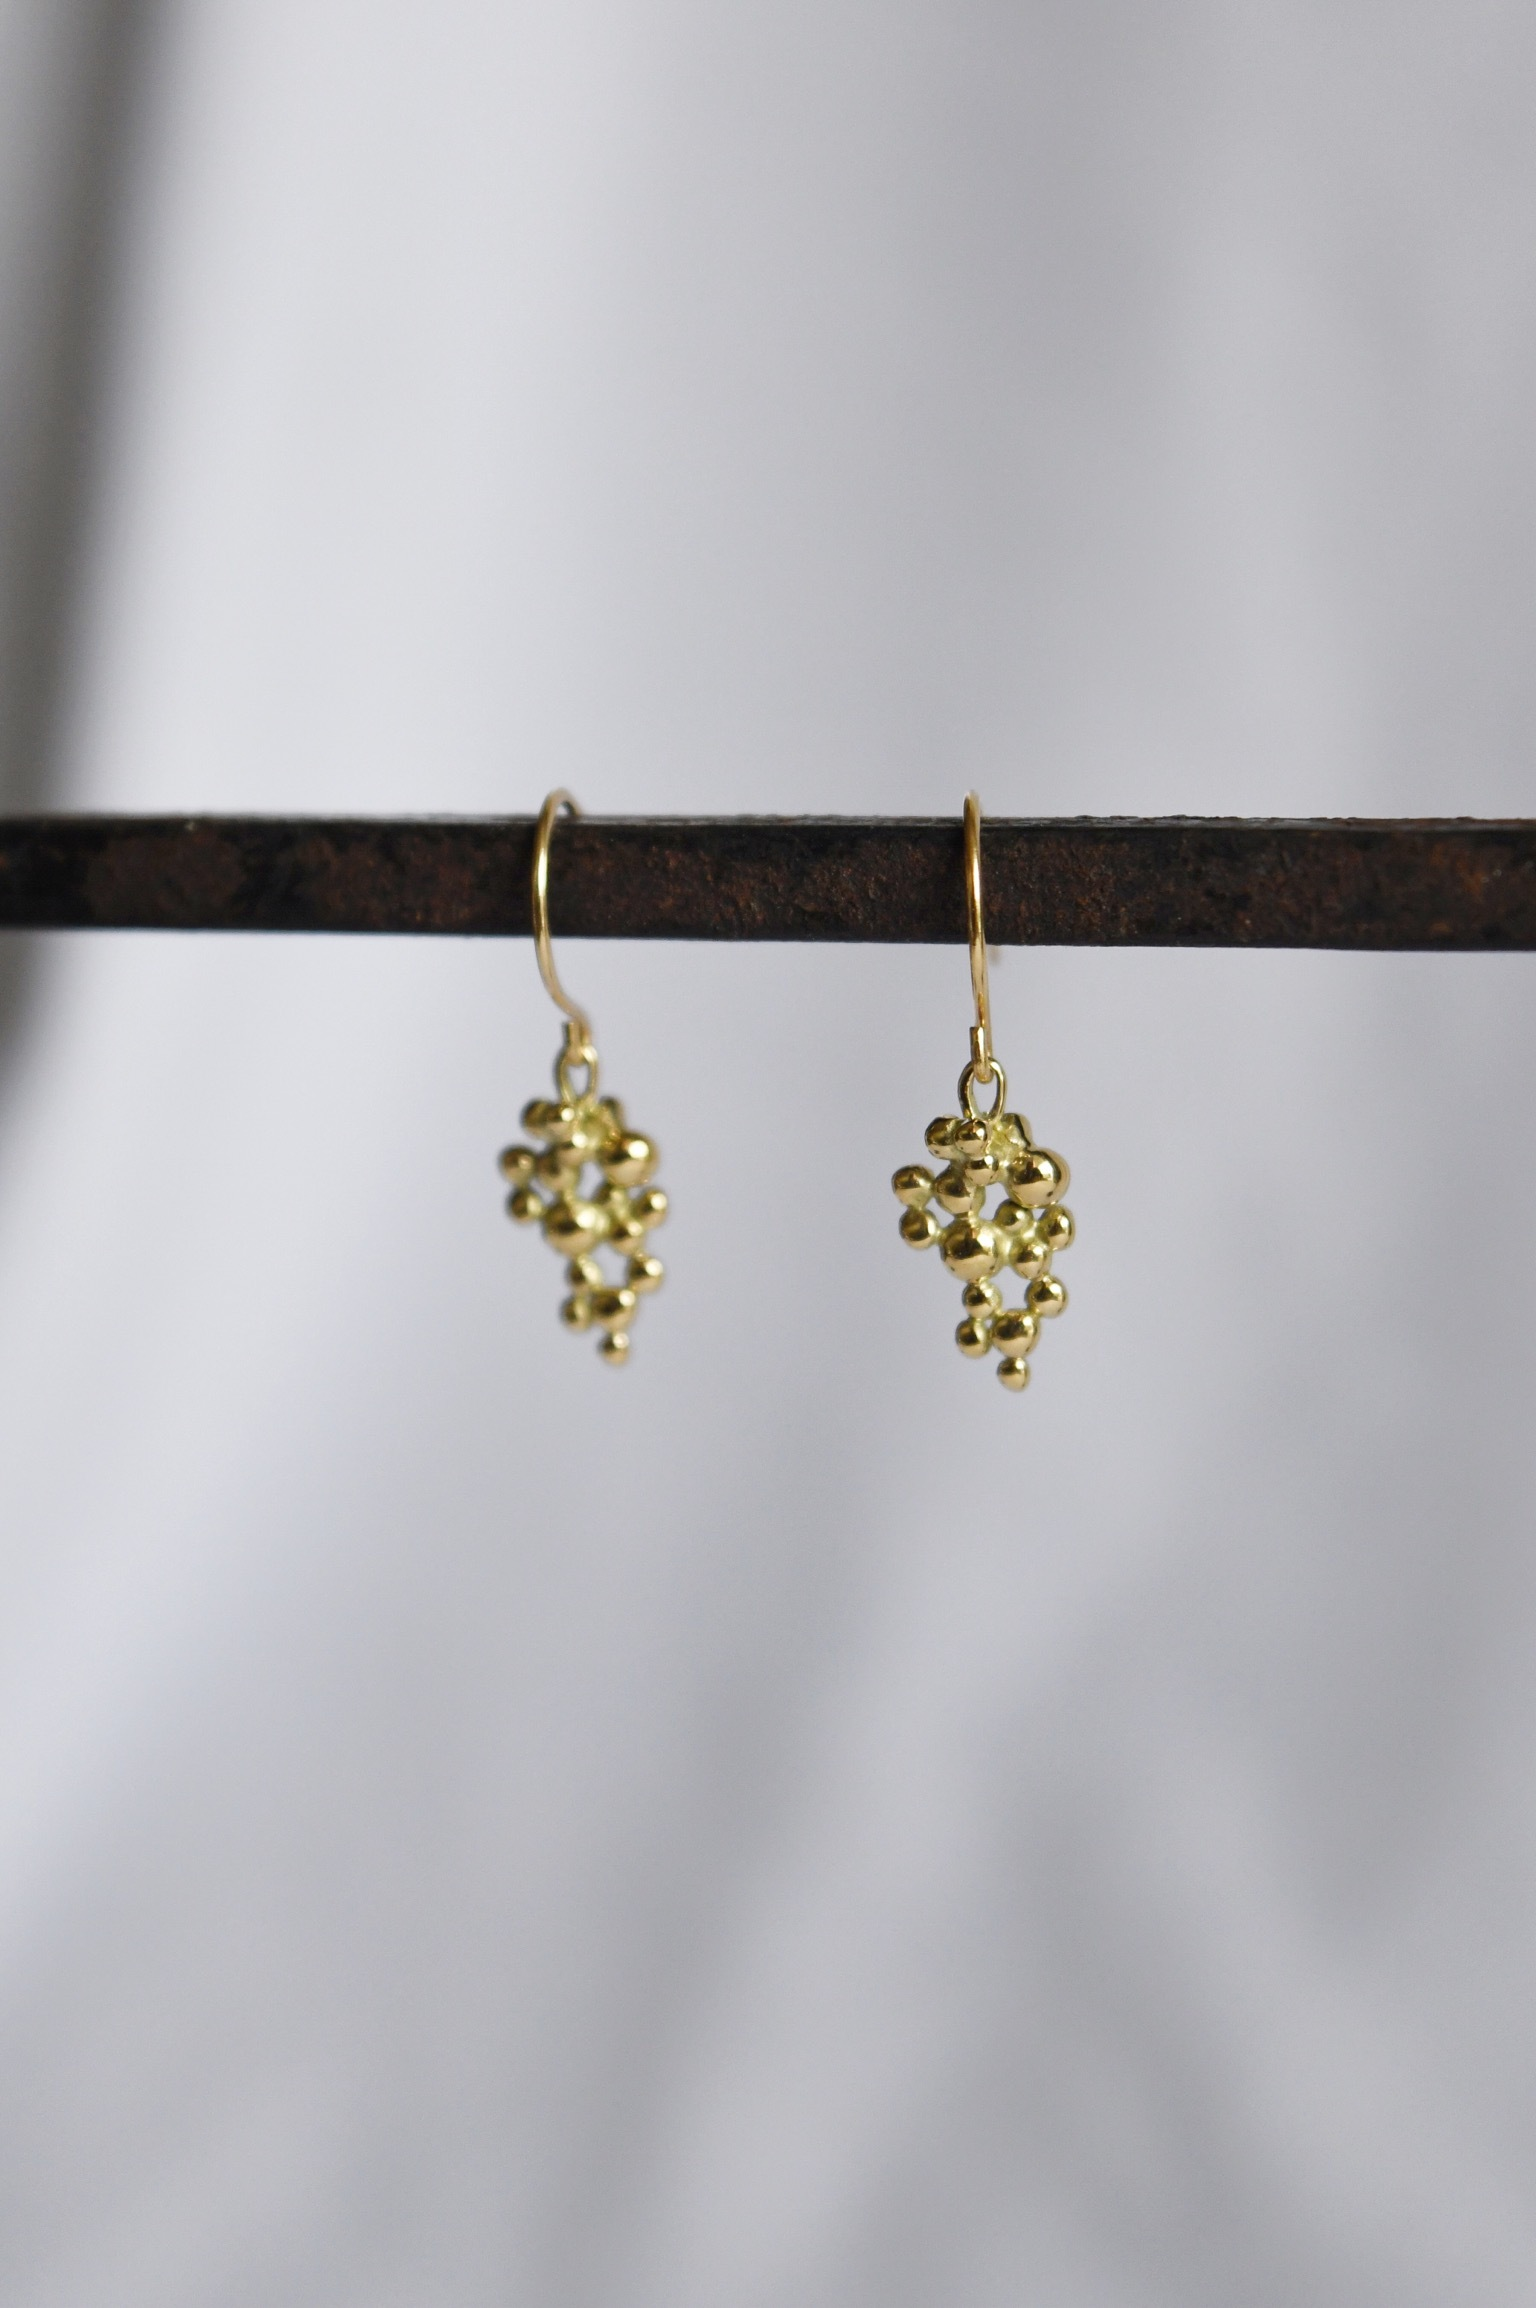 K18 Globes Earrings 18金グローブズピアス/イヤリング